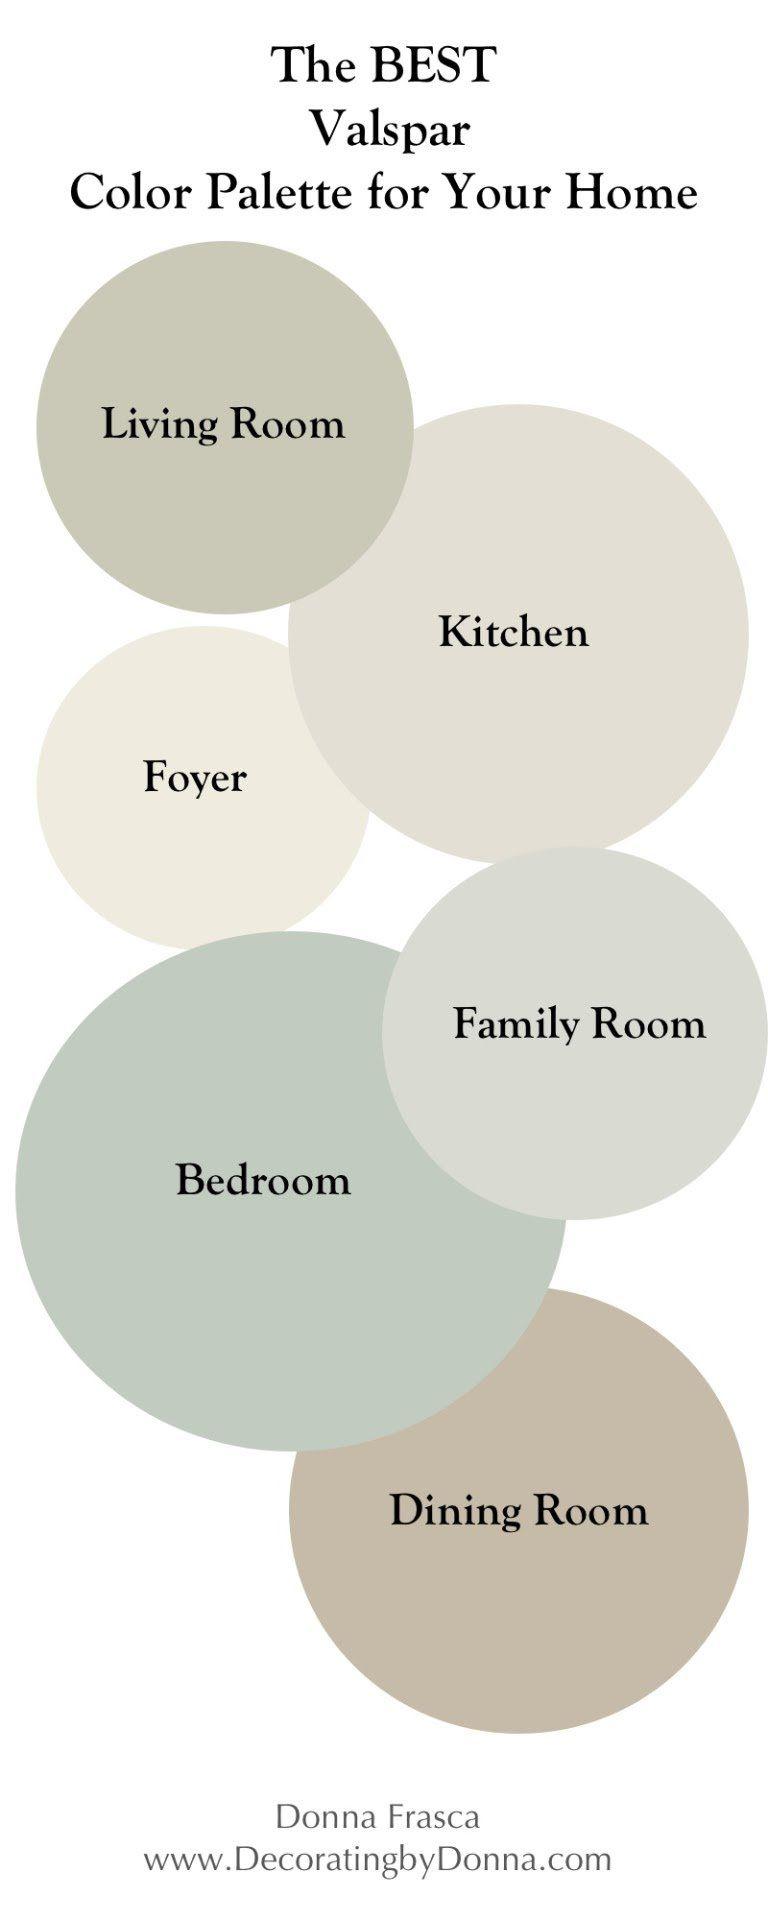 The Best Valspar Color Palette For Your Home  Valspar colors